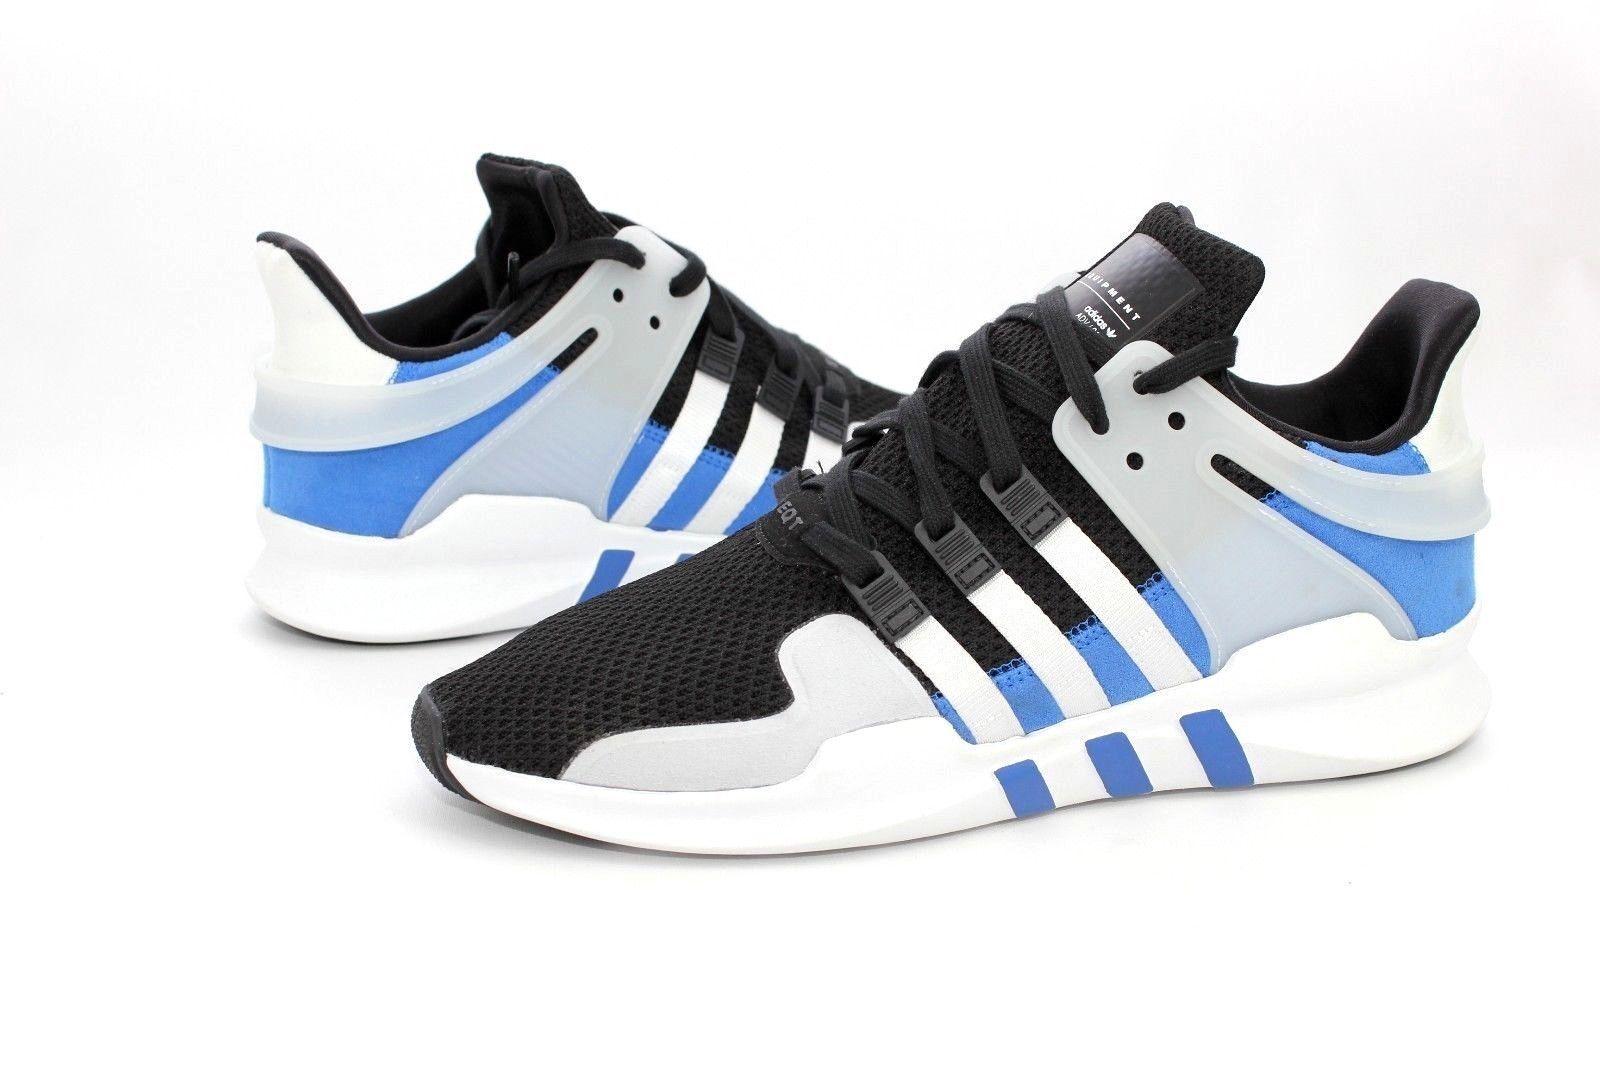 Adidas EQT Support Advanced BY9583 Nero White Light Grey Size 11.5 NIB